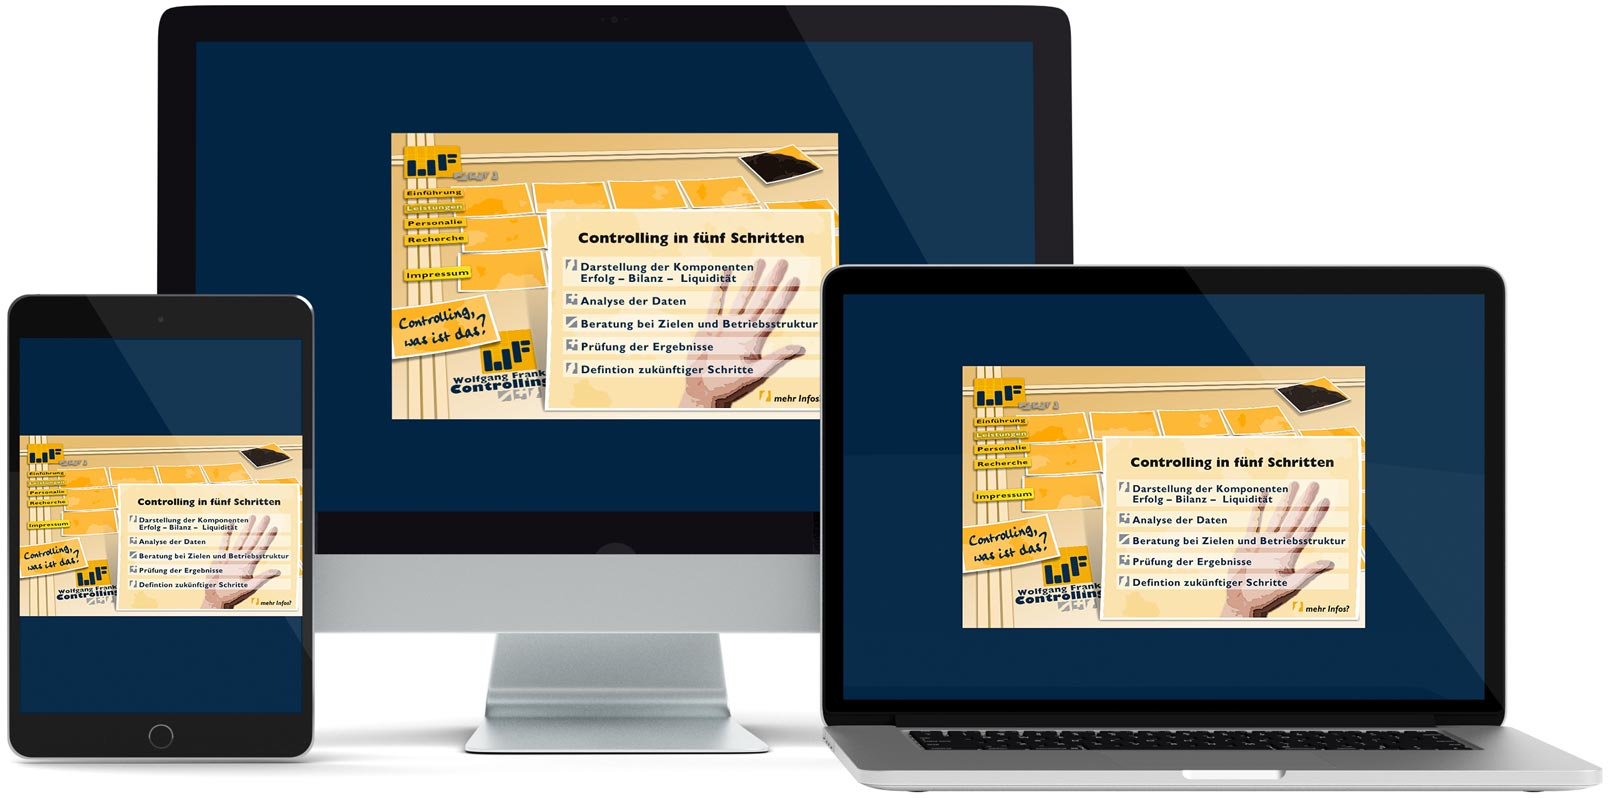 Dreamweaver Webdesign: Franken Controlling